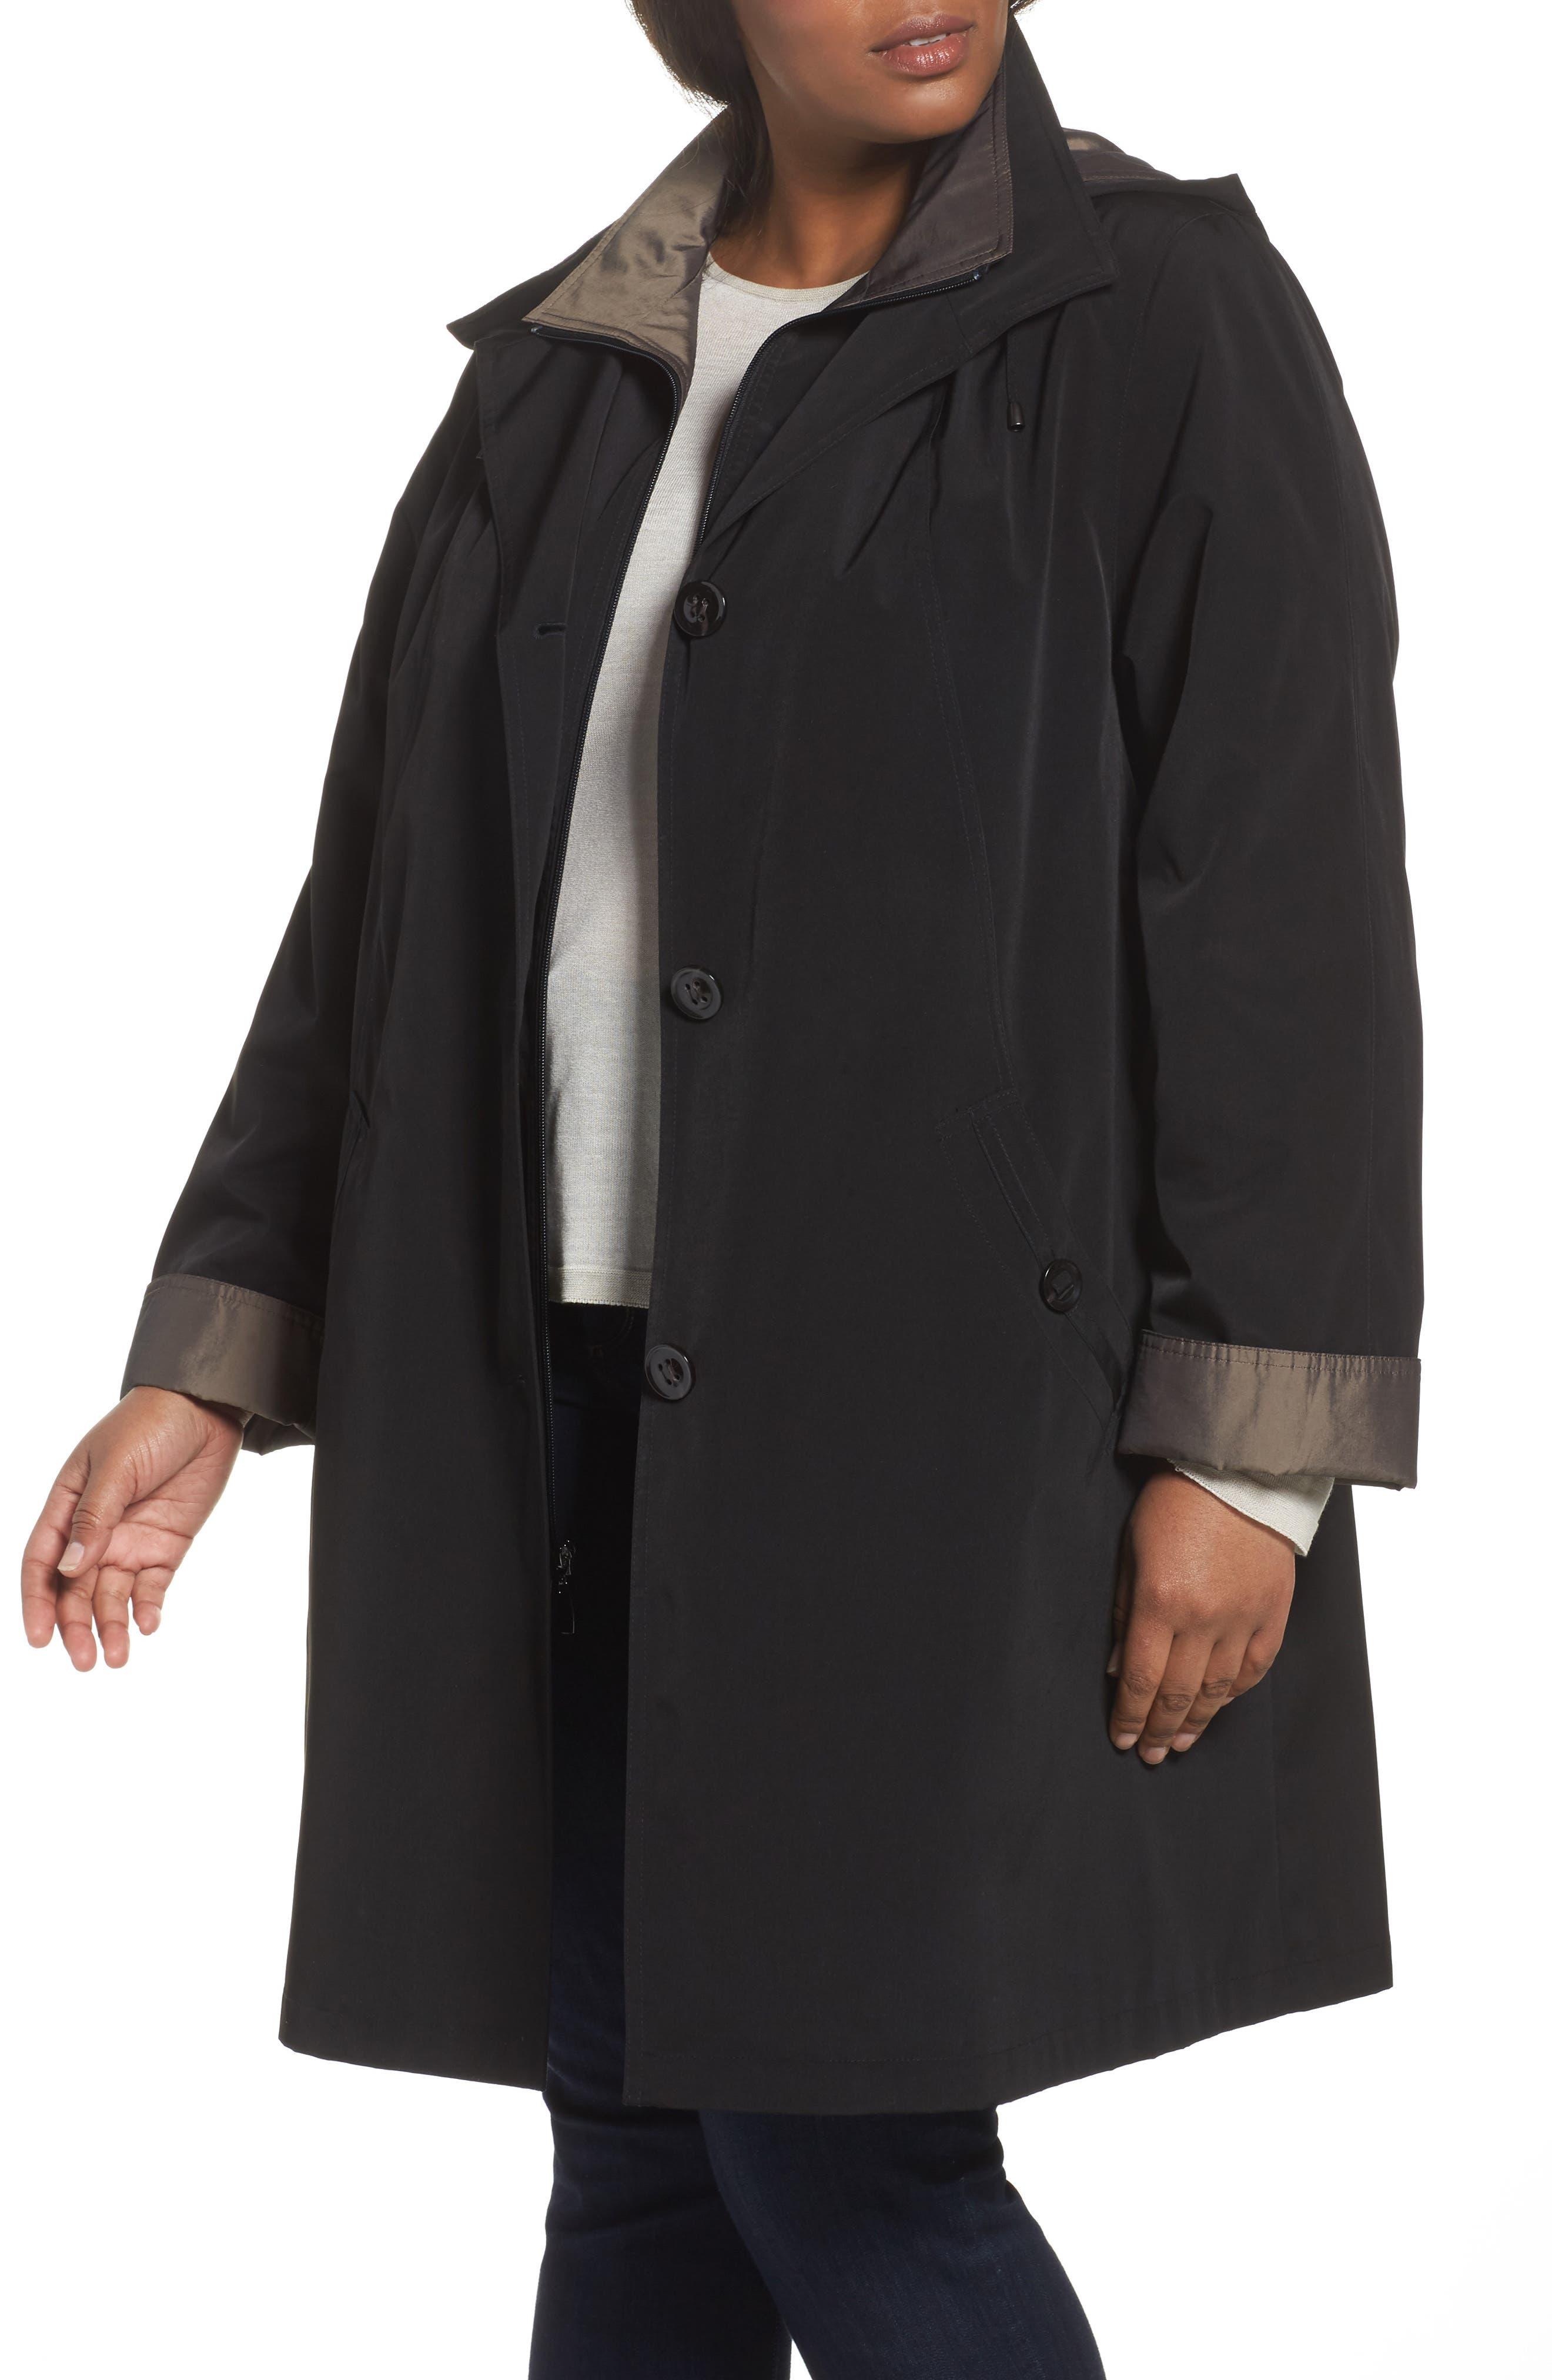 Two-Tone Long Silk Look Raincoat,                             Main thumbnail 1, color,                             BLACK